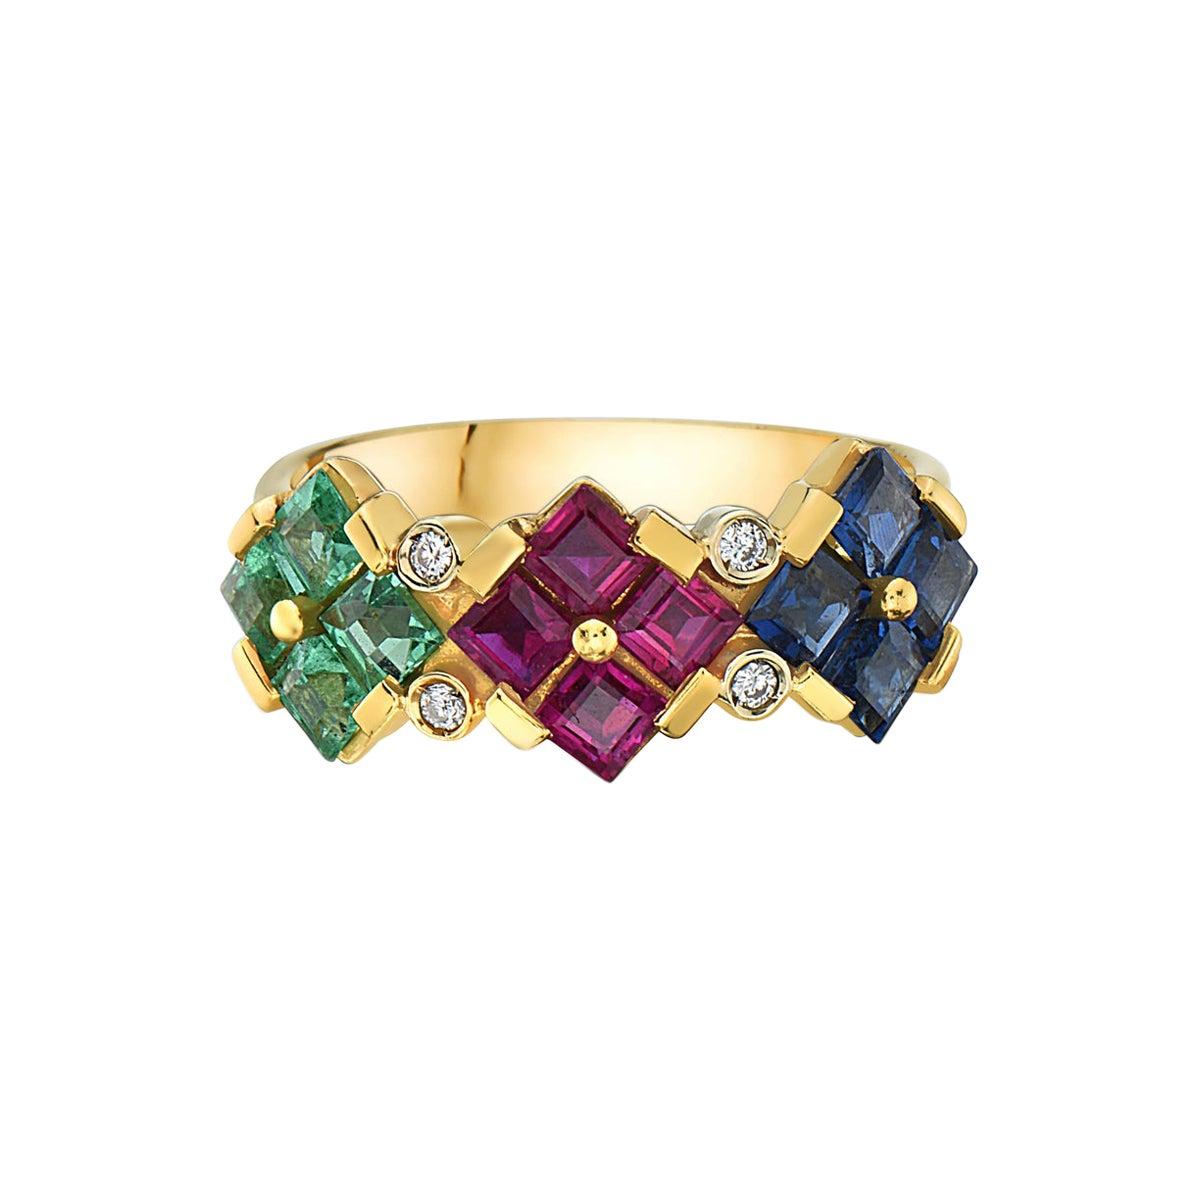 14 Karat Yellow Gold Ruby Sapphire Emerald and Diamond Ring